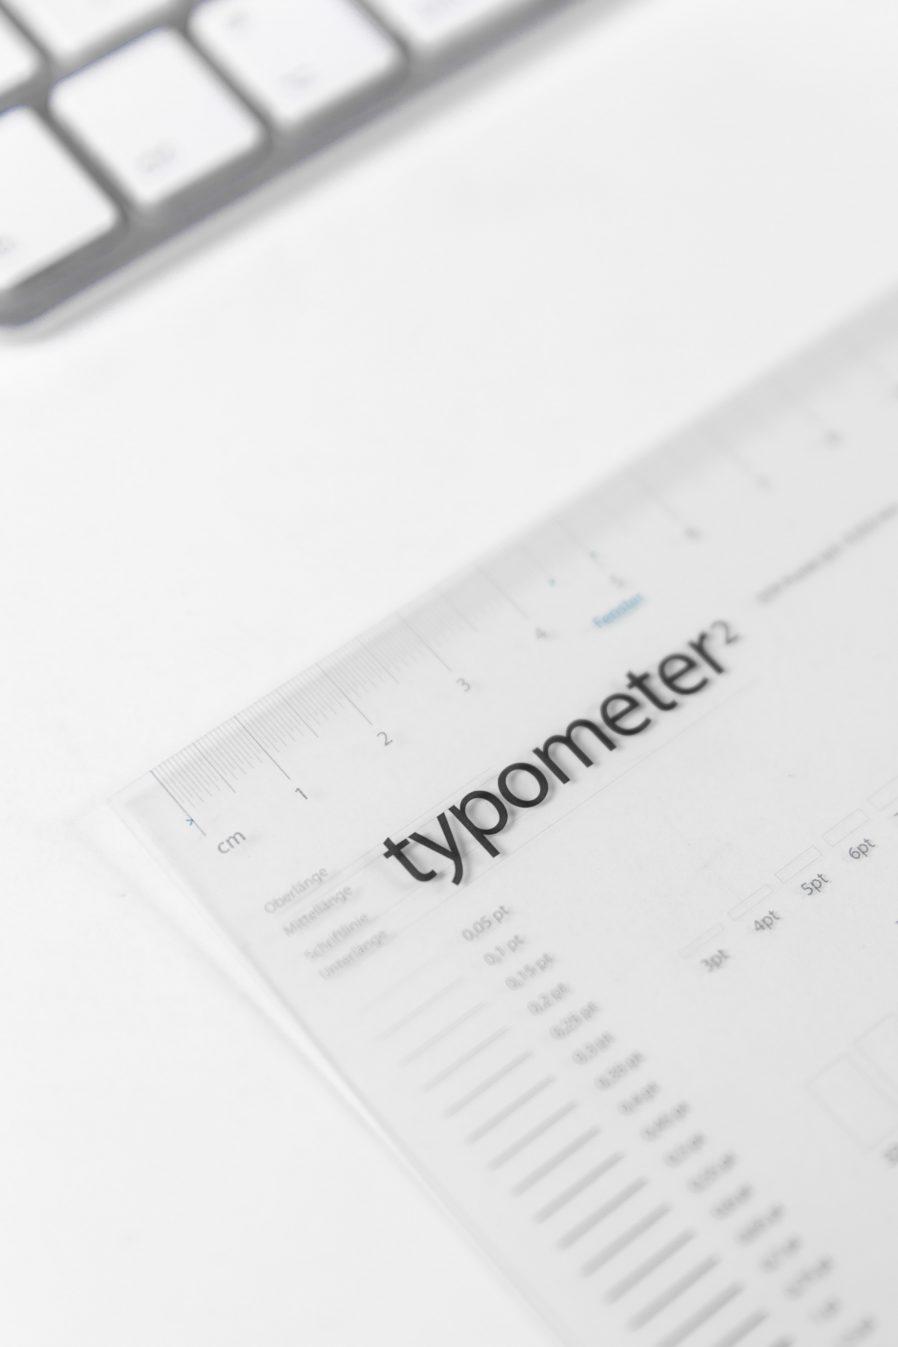 Typometer | typografischen Maßstab | Mikrotypografie